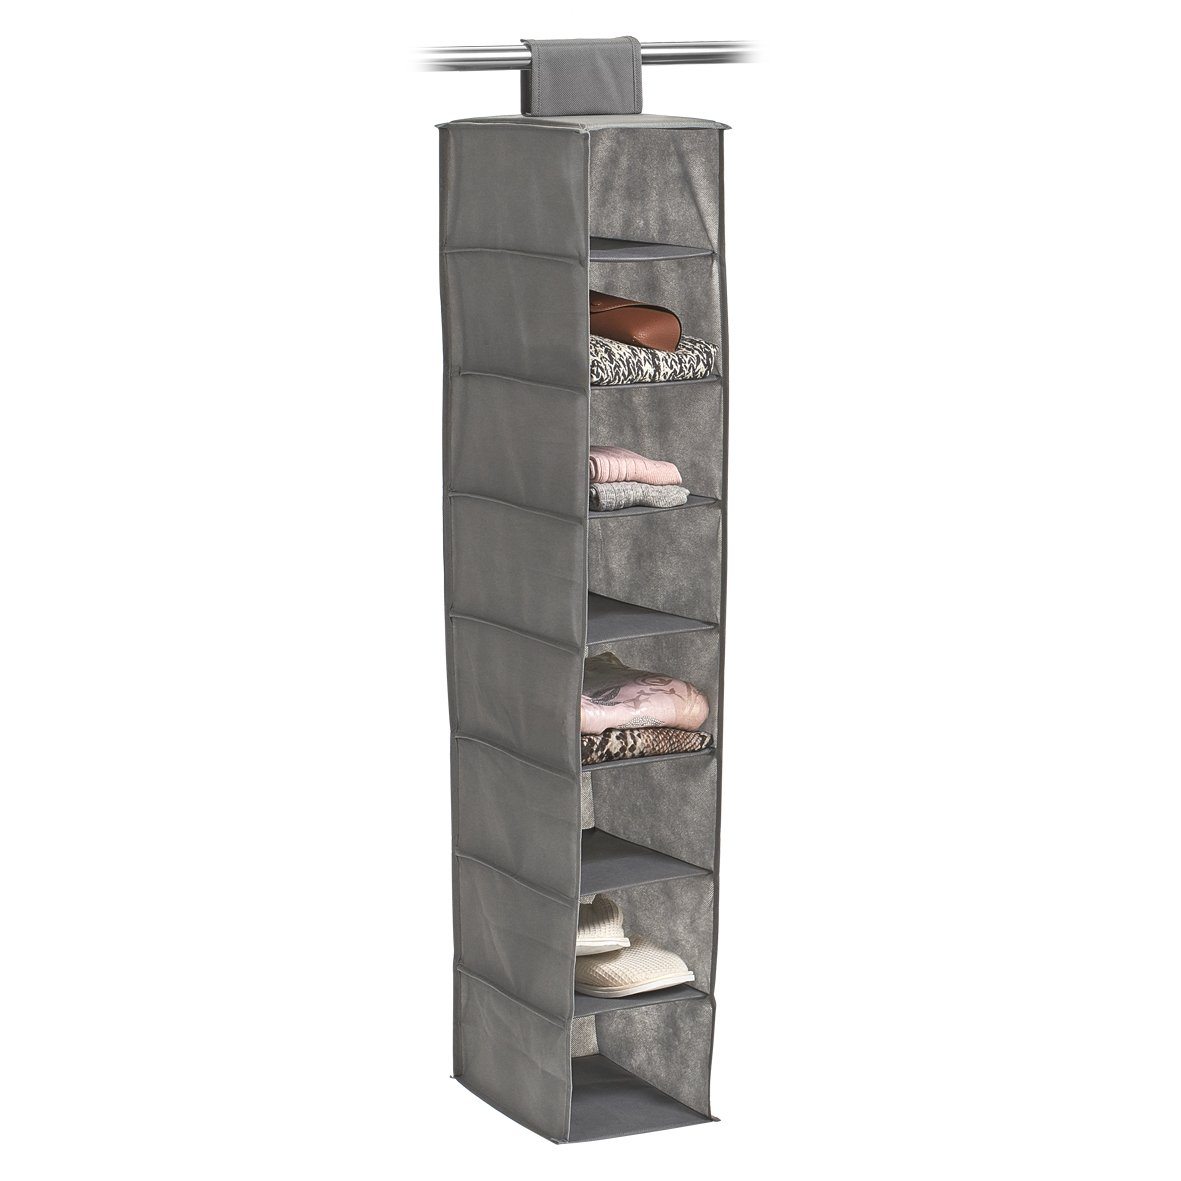 Zeller 14614Colgantes de Almacenamiento, 8Compartimentos, Papel, plástico, Gris, 18x 30x 105cm Zeller Present